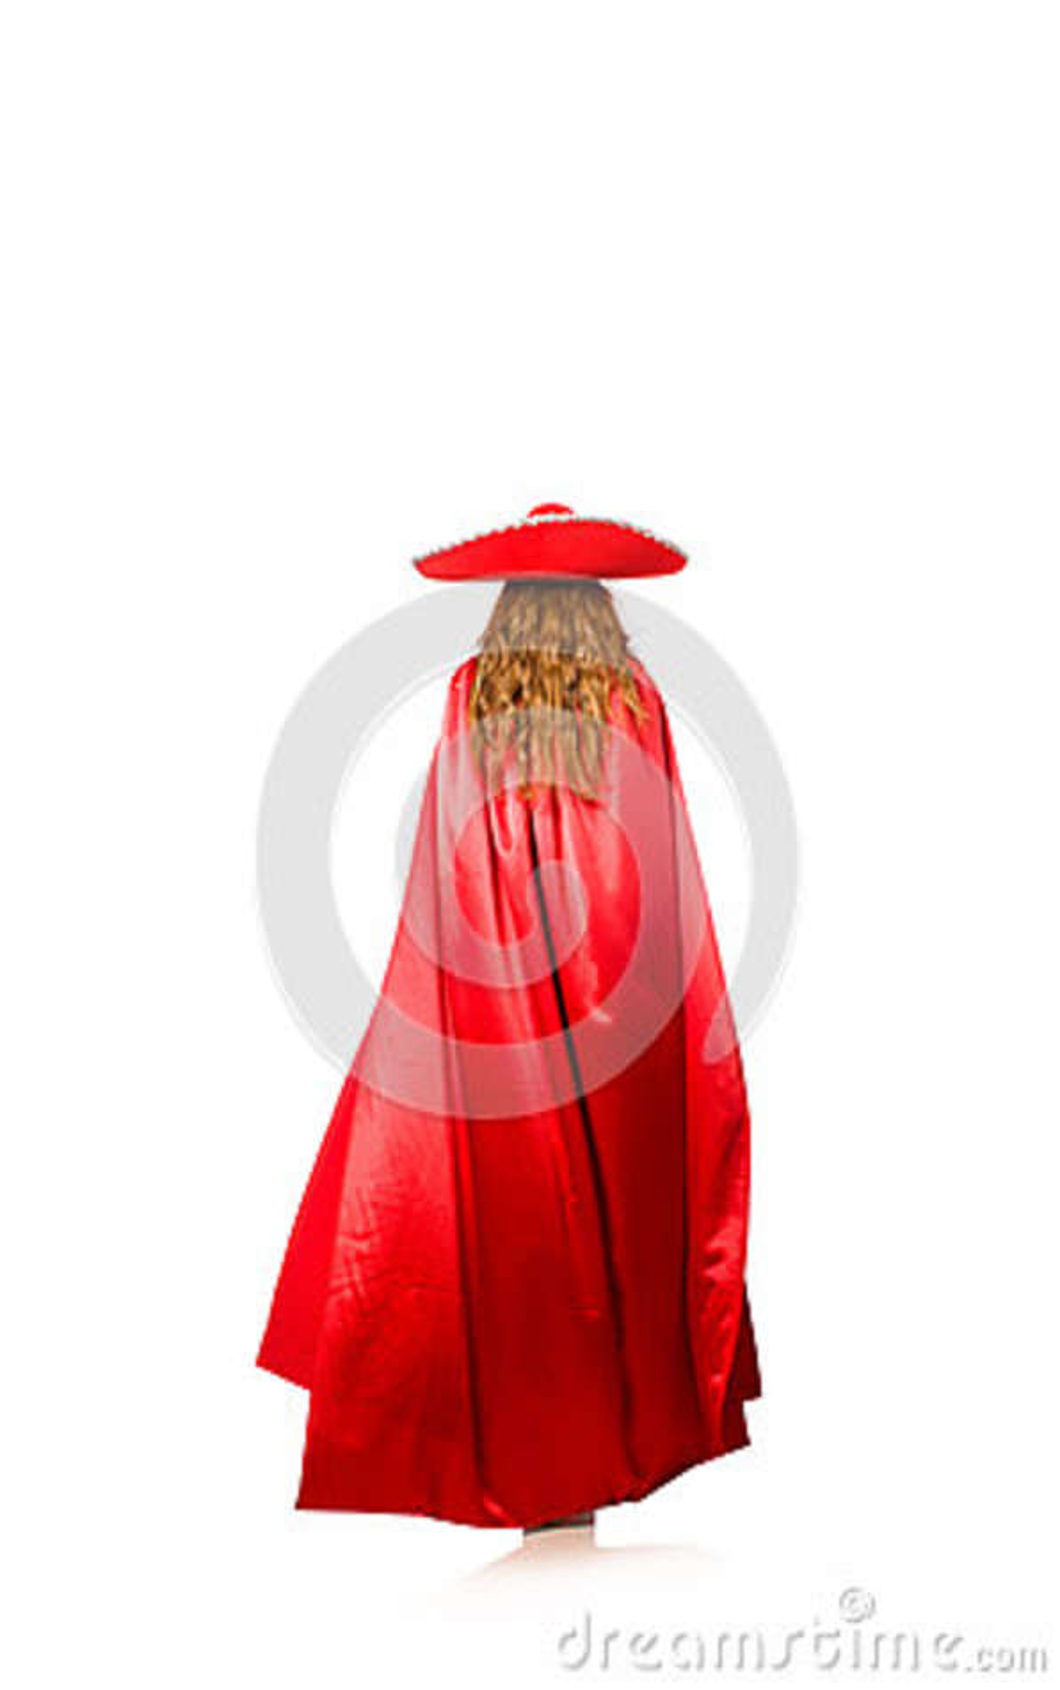 Mujer mexicana en ropa roja